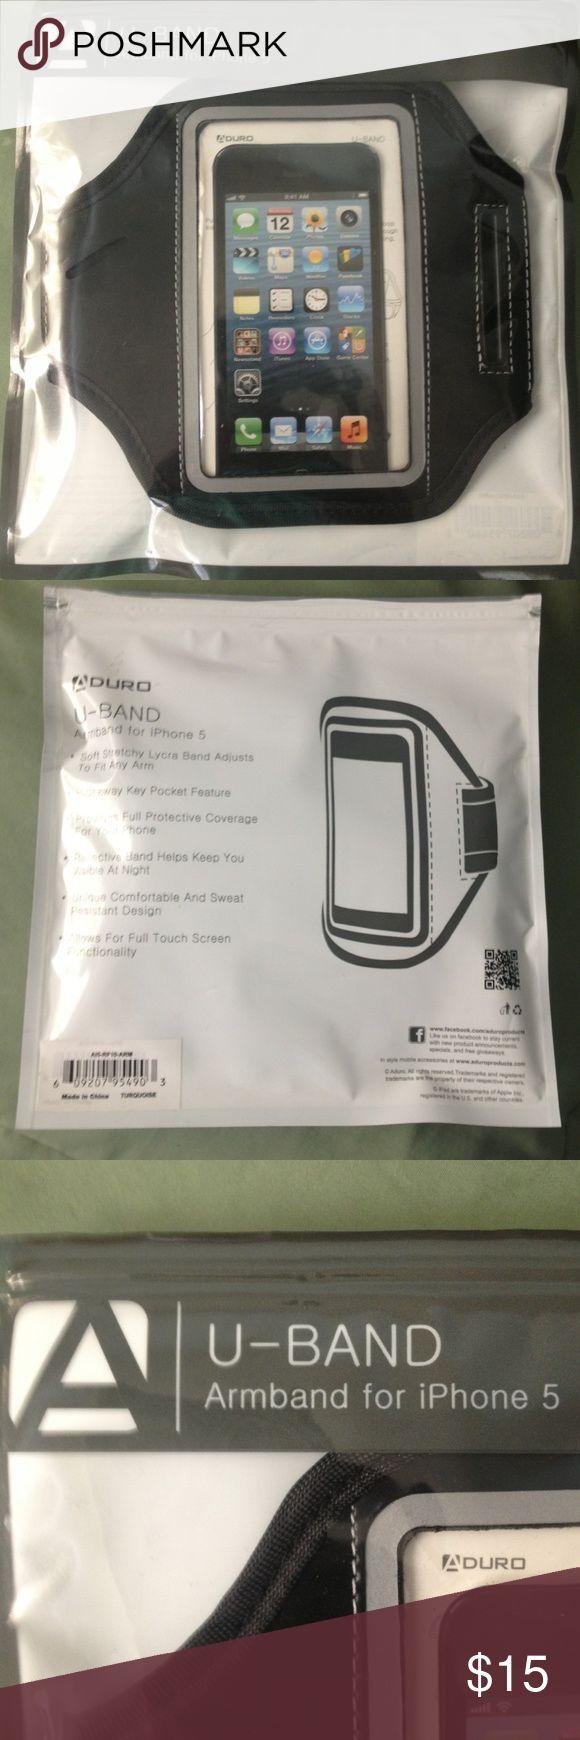 Aduro U-Band Armband for iPhone 5 Aduro U-Band Armband for I.Phone5 black NIP Aduro Accessories